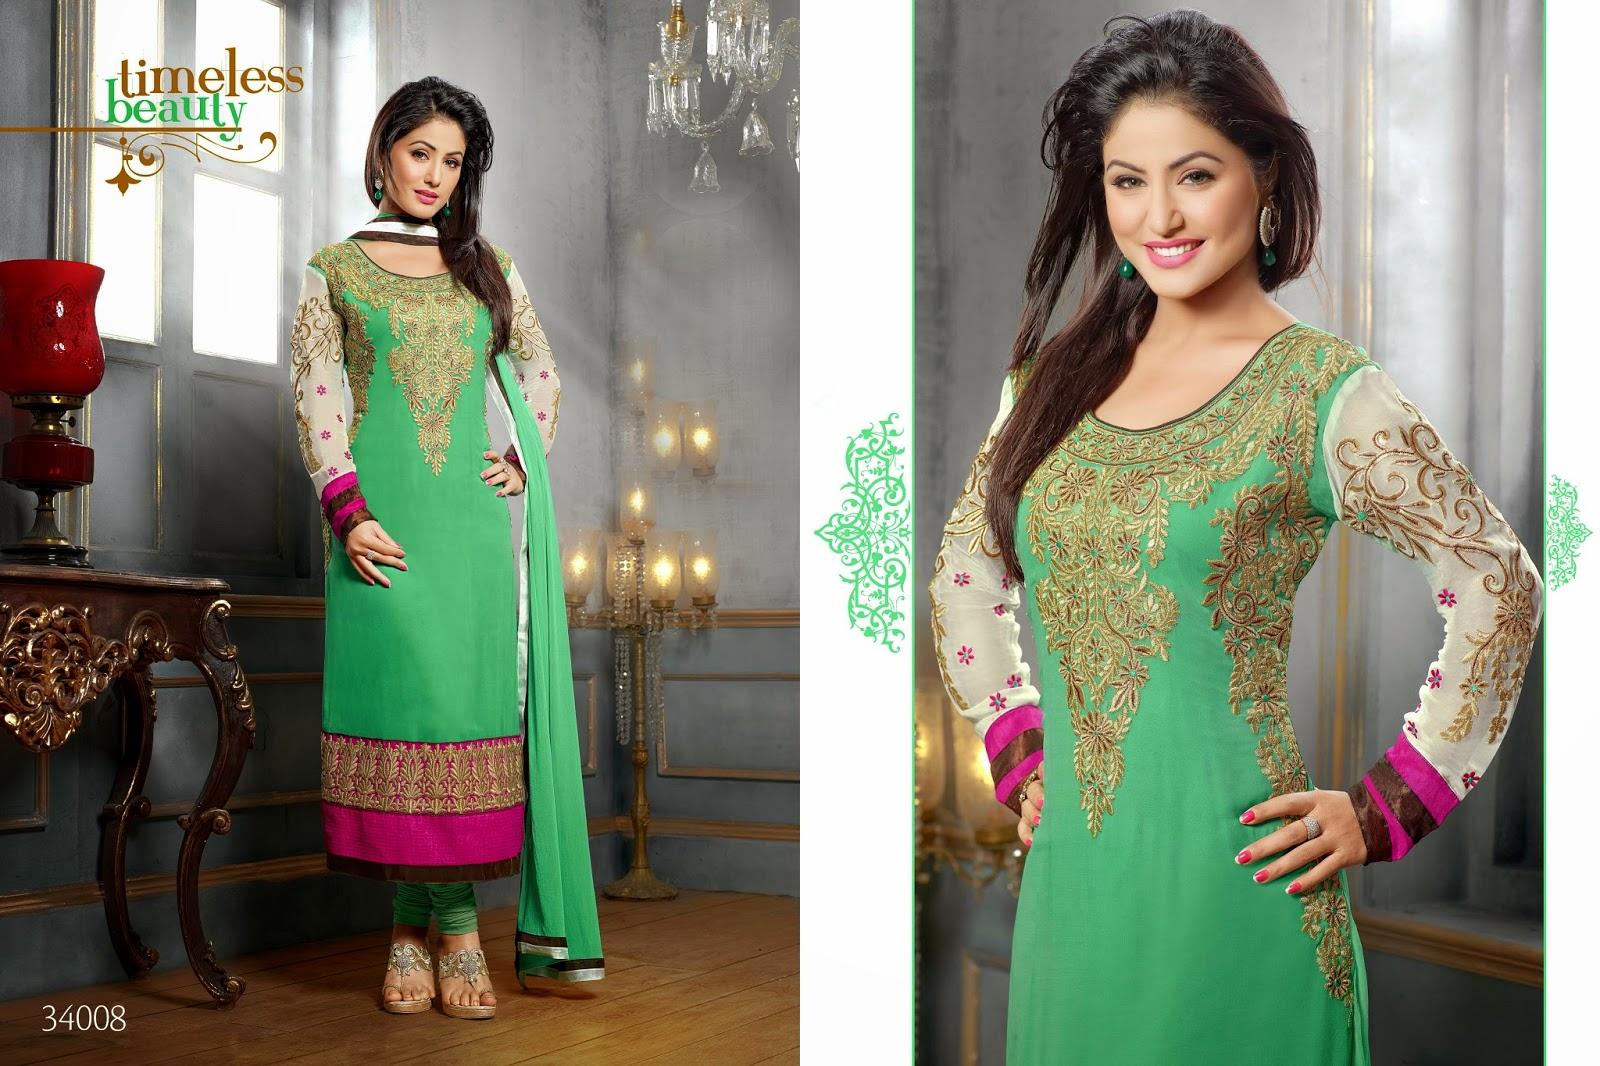 Ethnic women wear hina khan latest pakistani style long salwar kameez